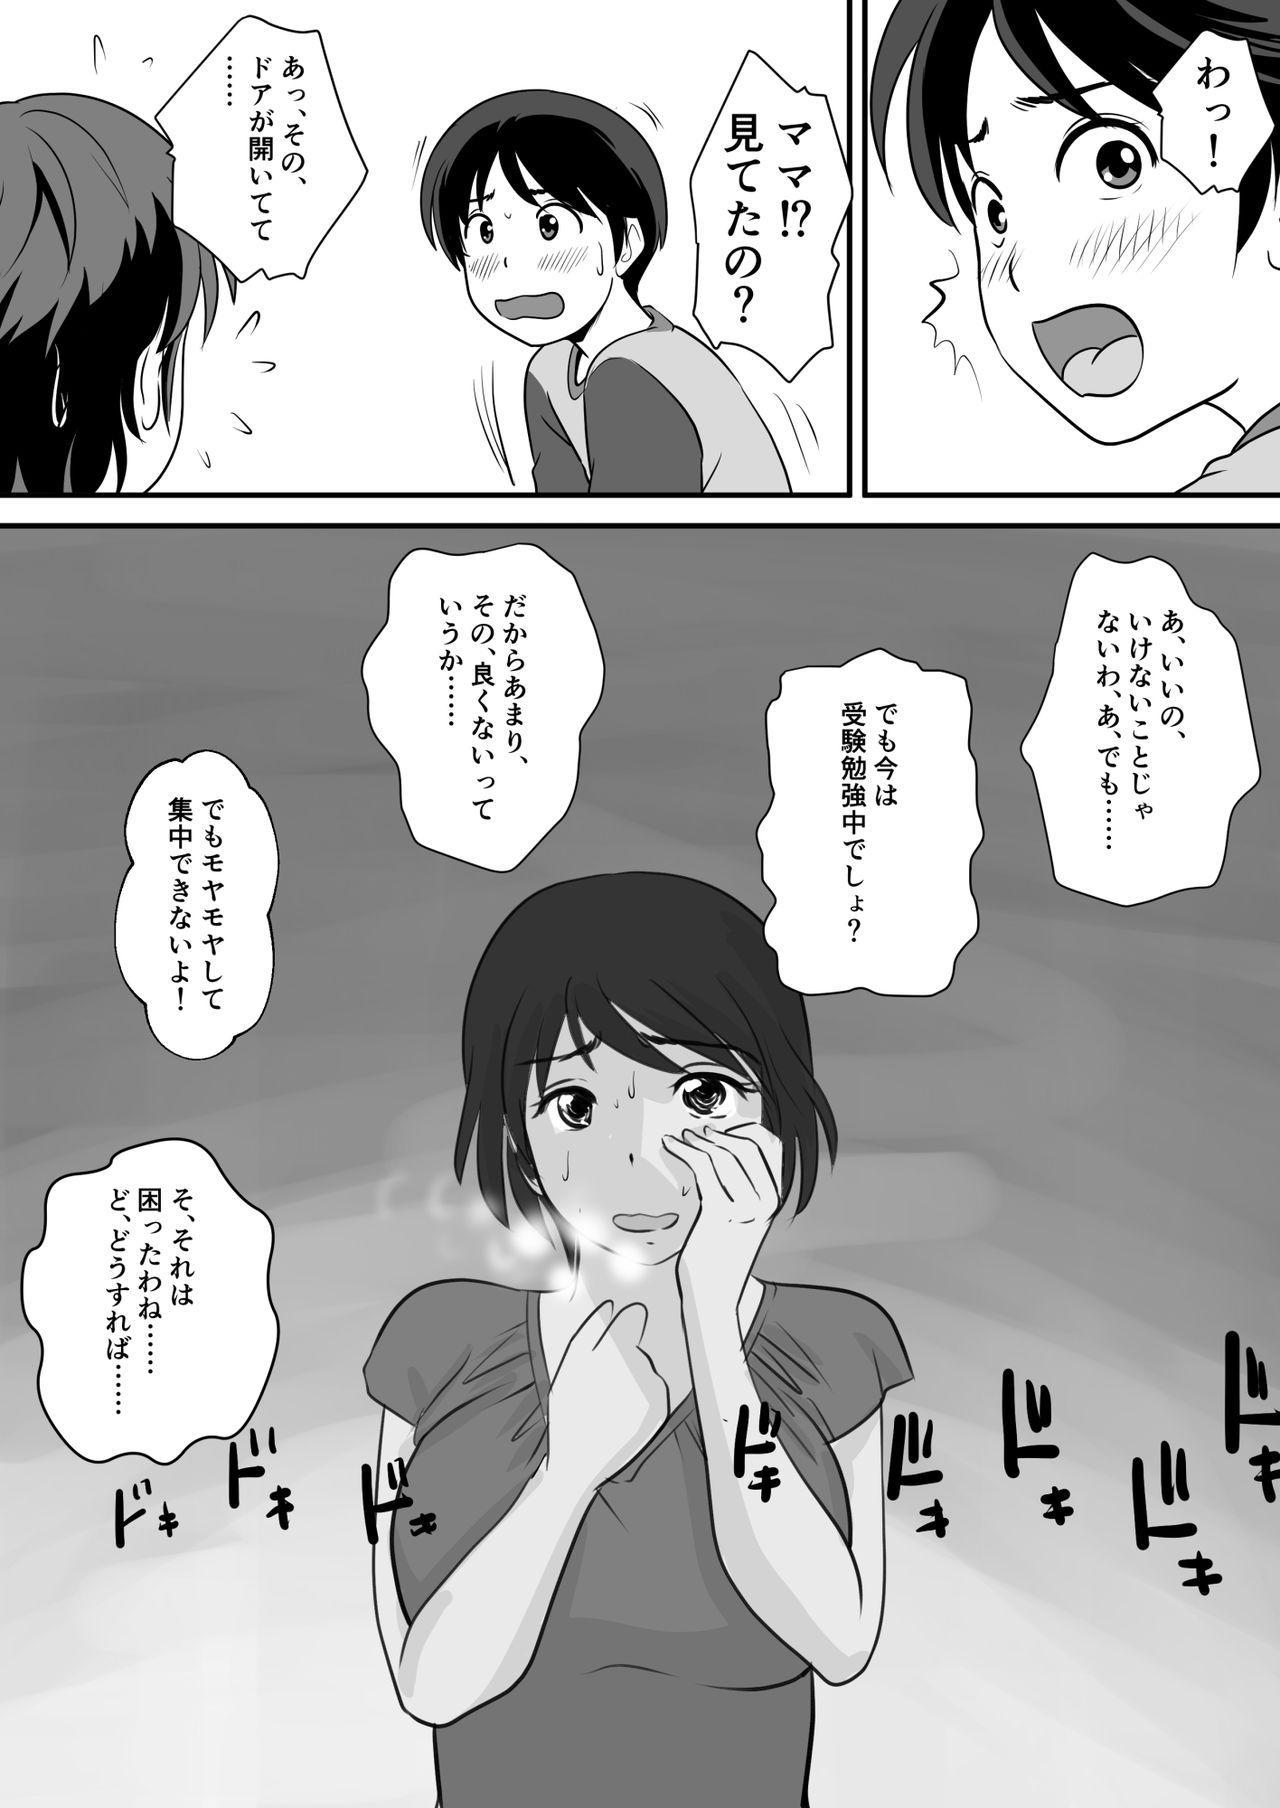 [Milky Club] Netori Appli -Kuso Oyaji kara Kaa-san o Netotta ken- 13